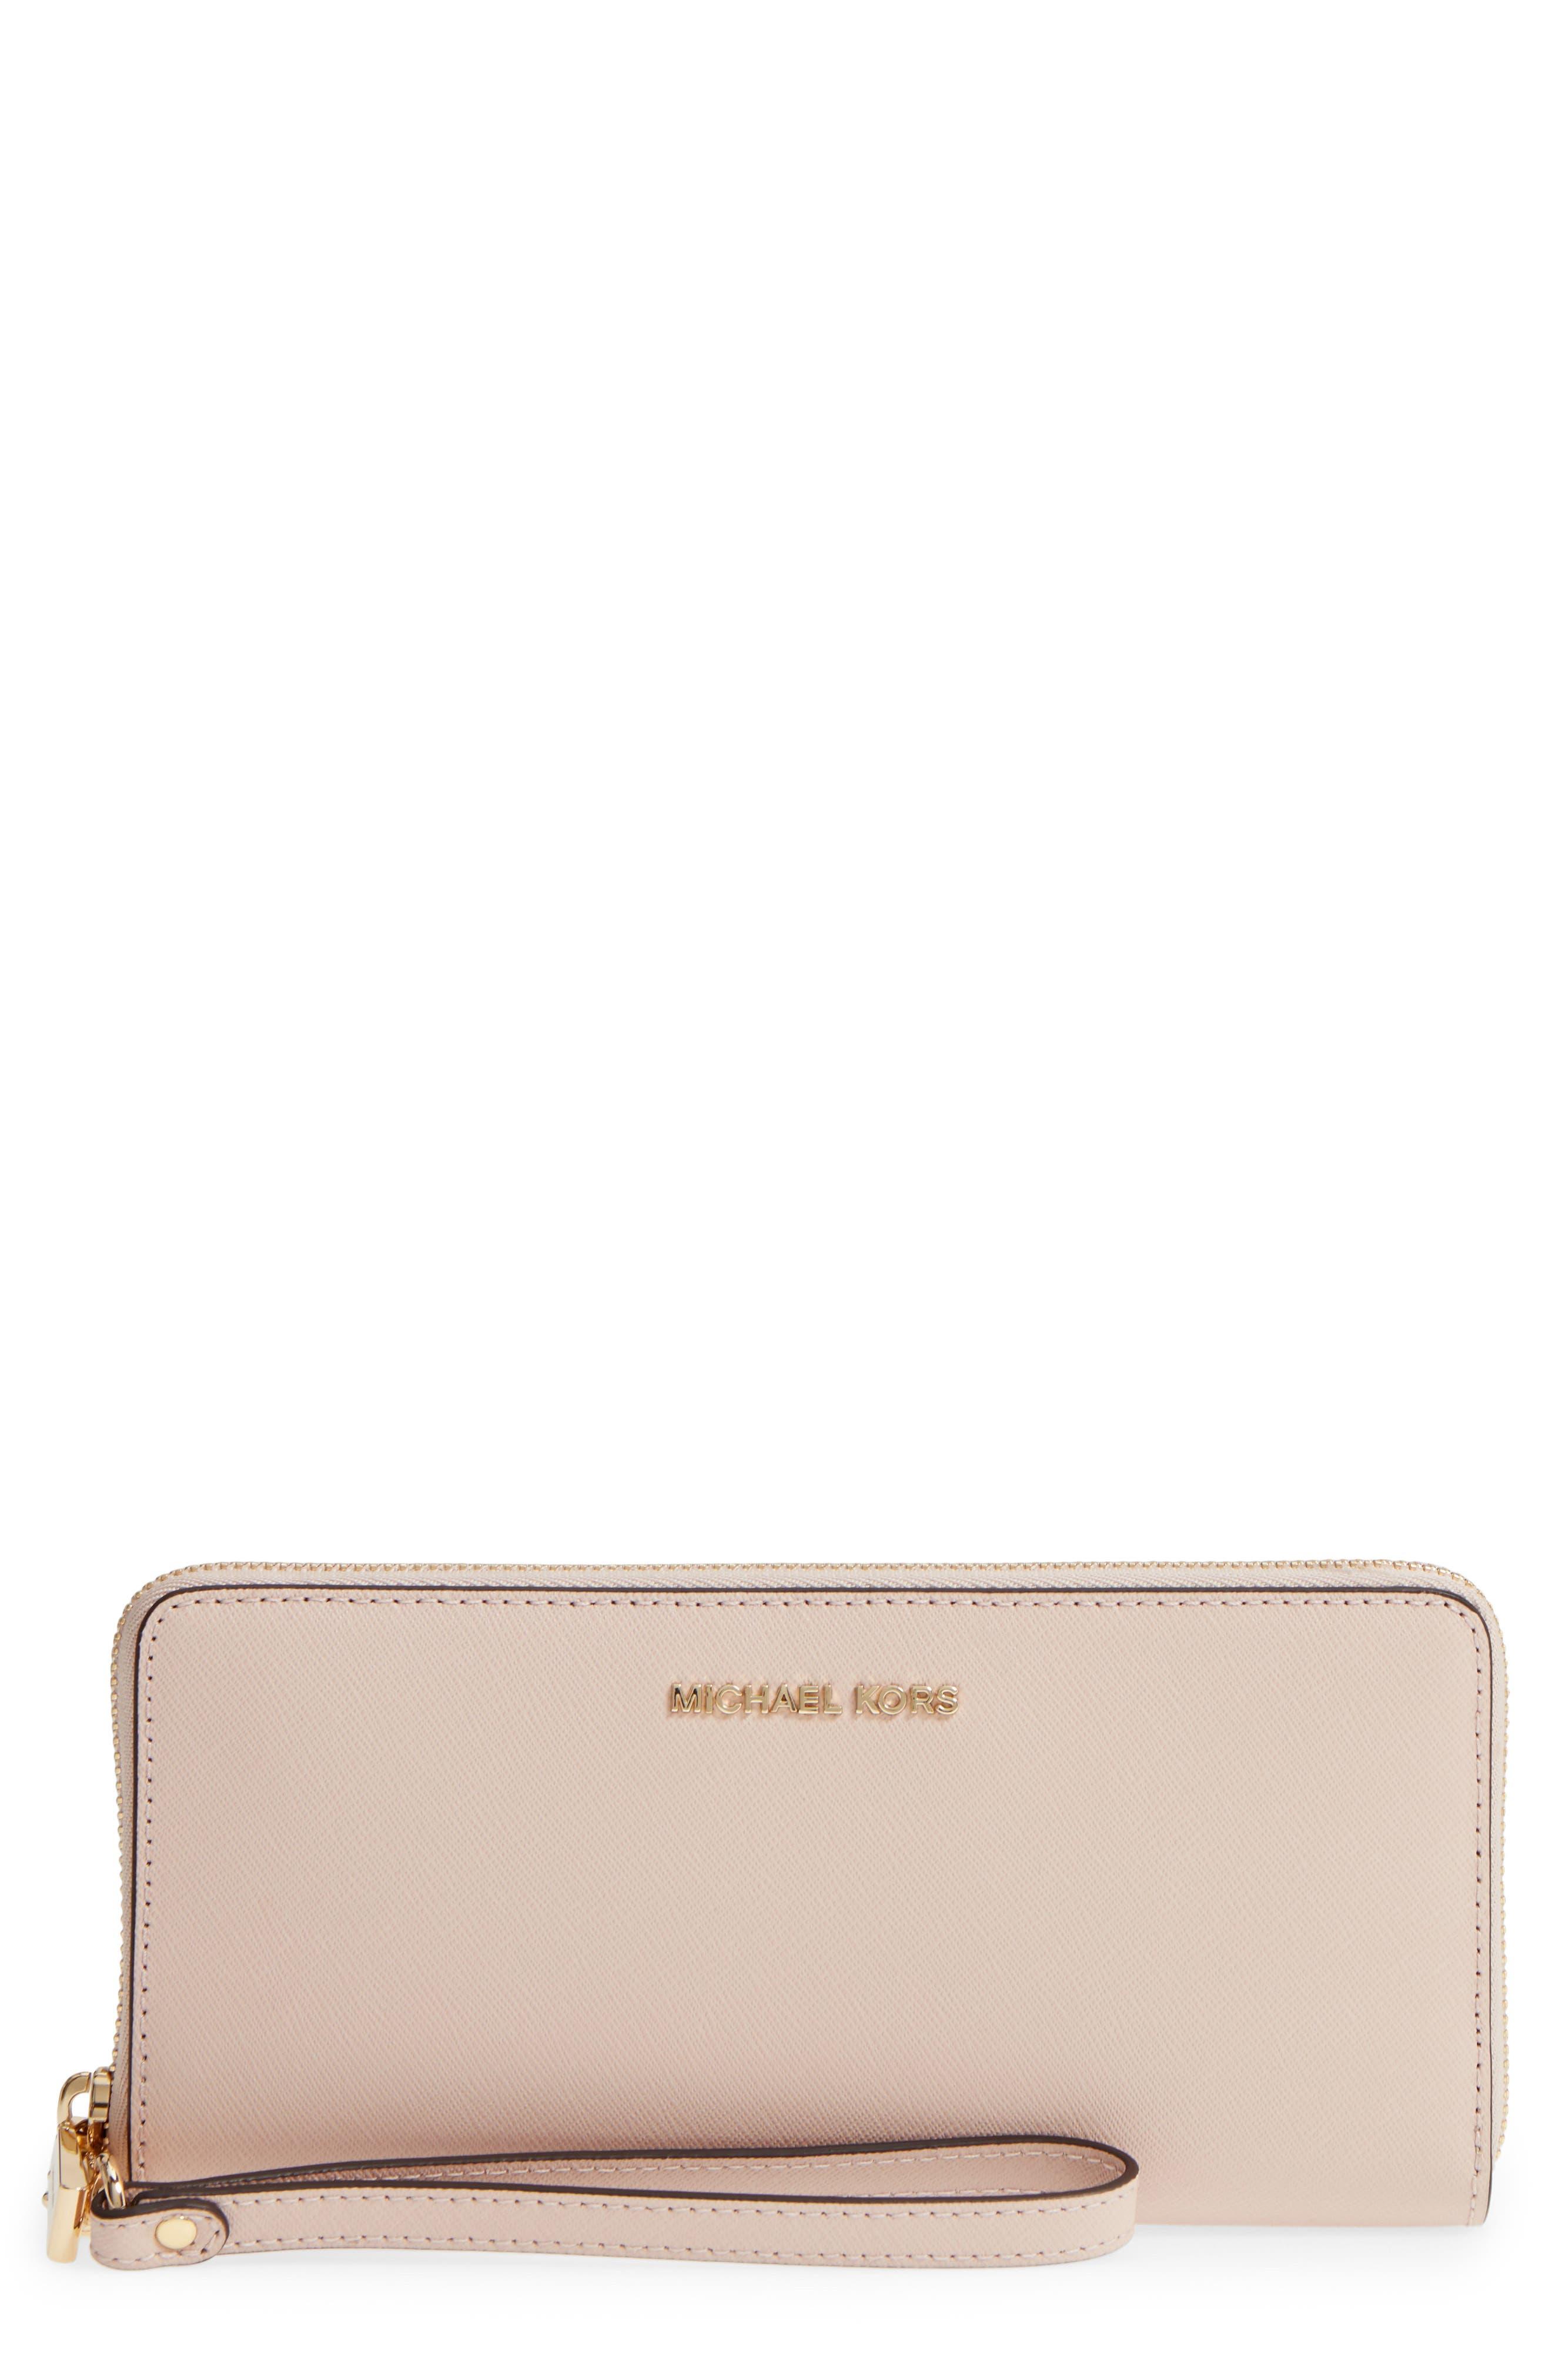 Main Image - MICHAEL Michael Kors 'Jet Set' Leather Travel Wallet